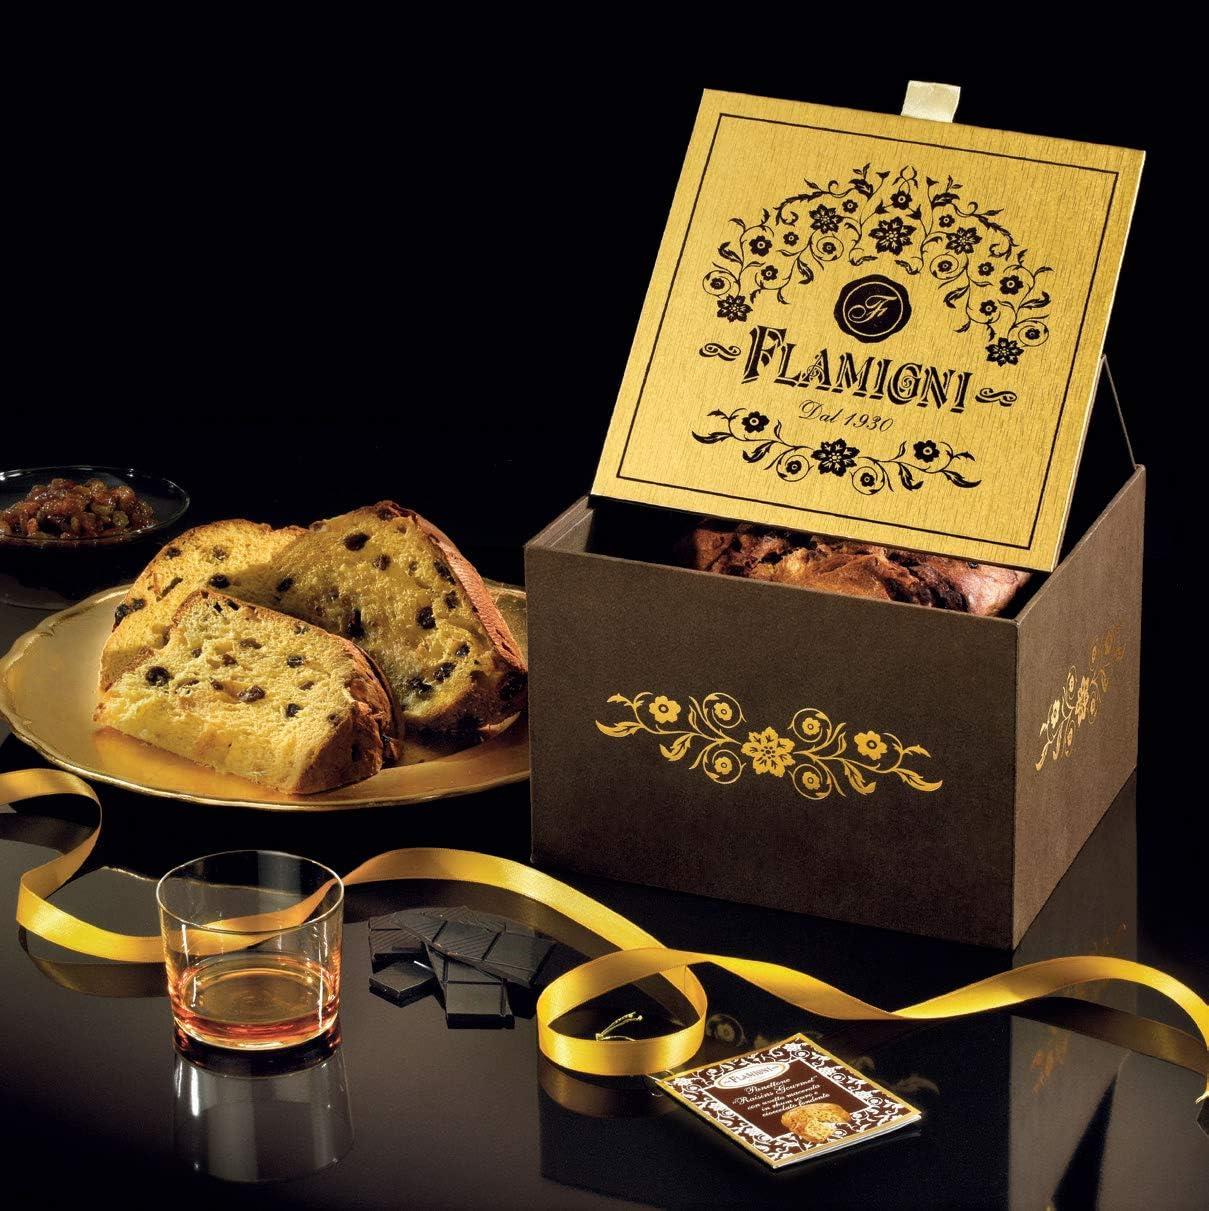 Flamigni - Panettone gourmet con ron y chocolate 1kg